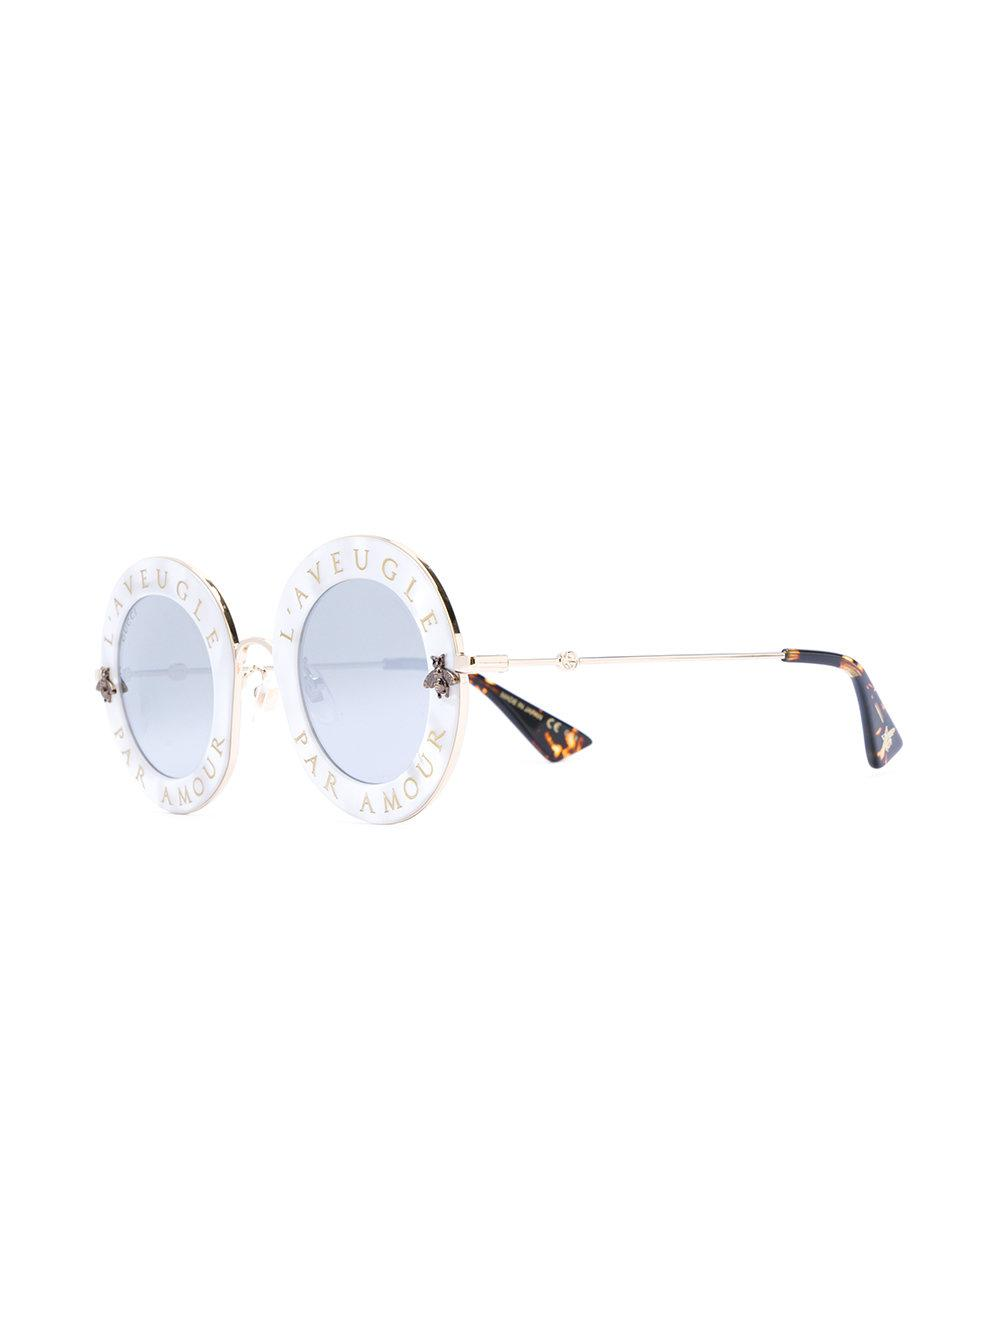 ab31f52b07a Gucci L aveugle Par Amour Sunglasses - Lyst